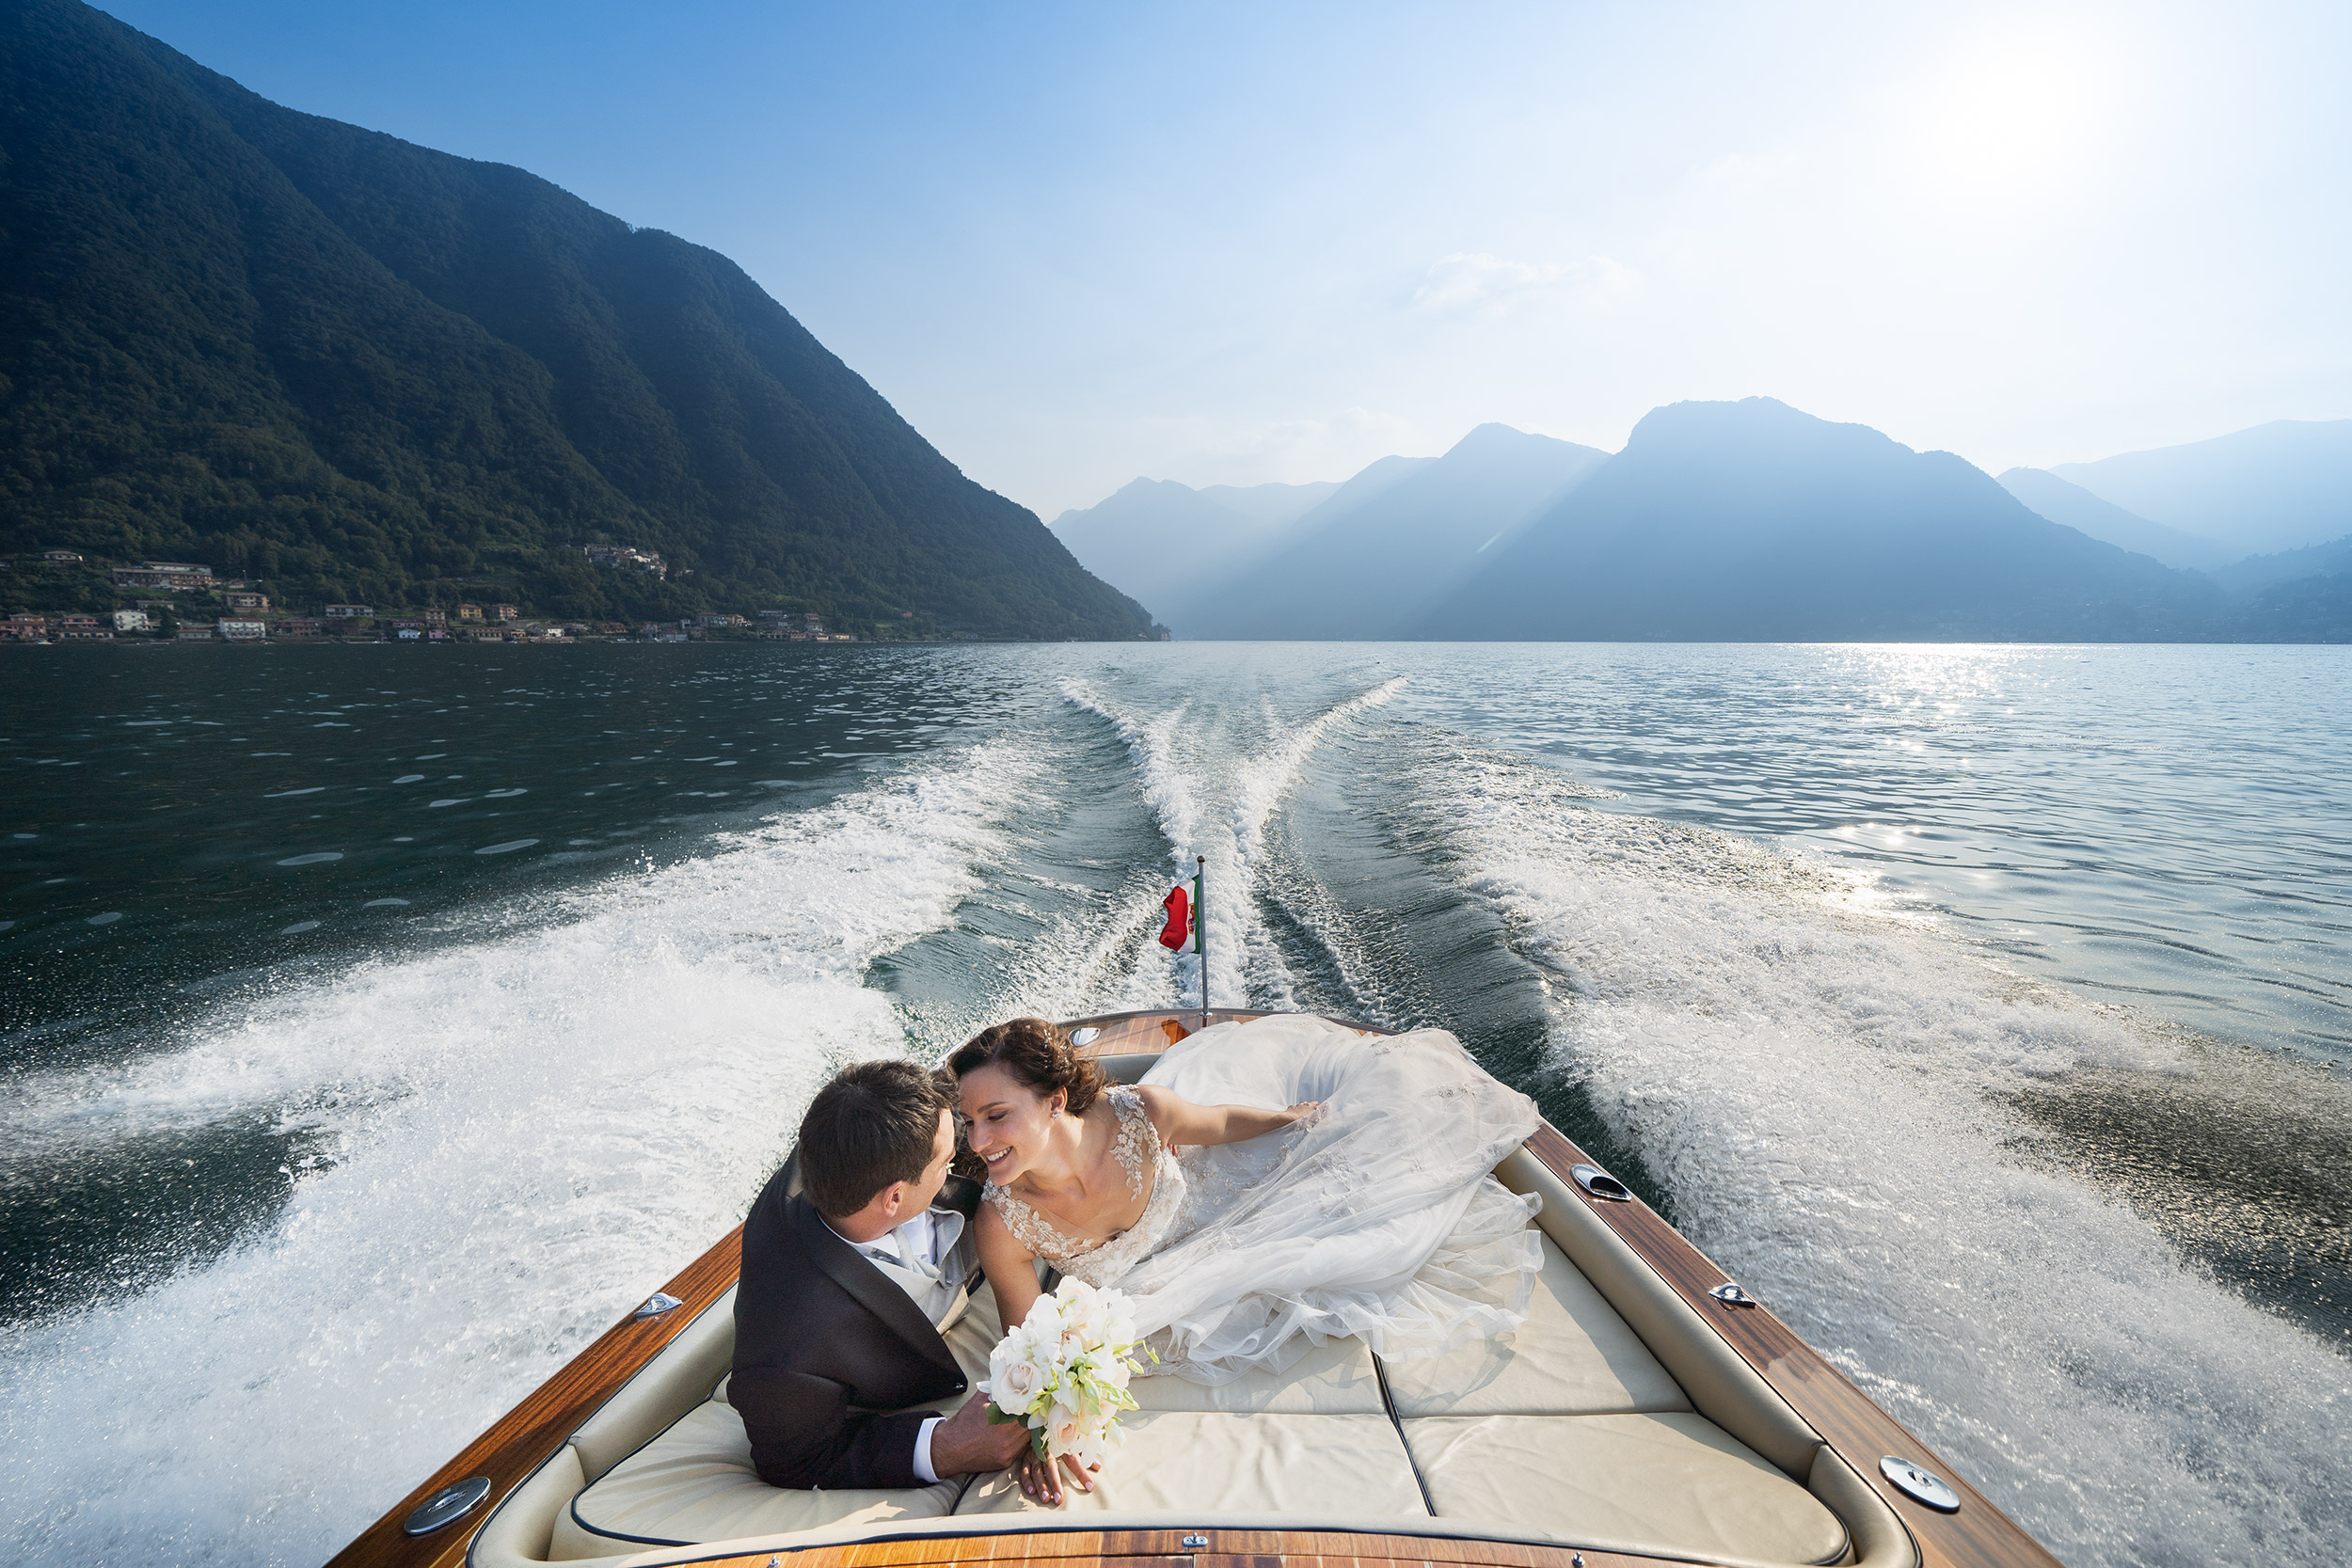 000 reportage sposi foto matrimonio wedding barca lago como 1